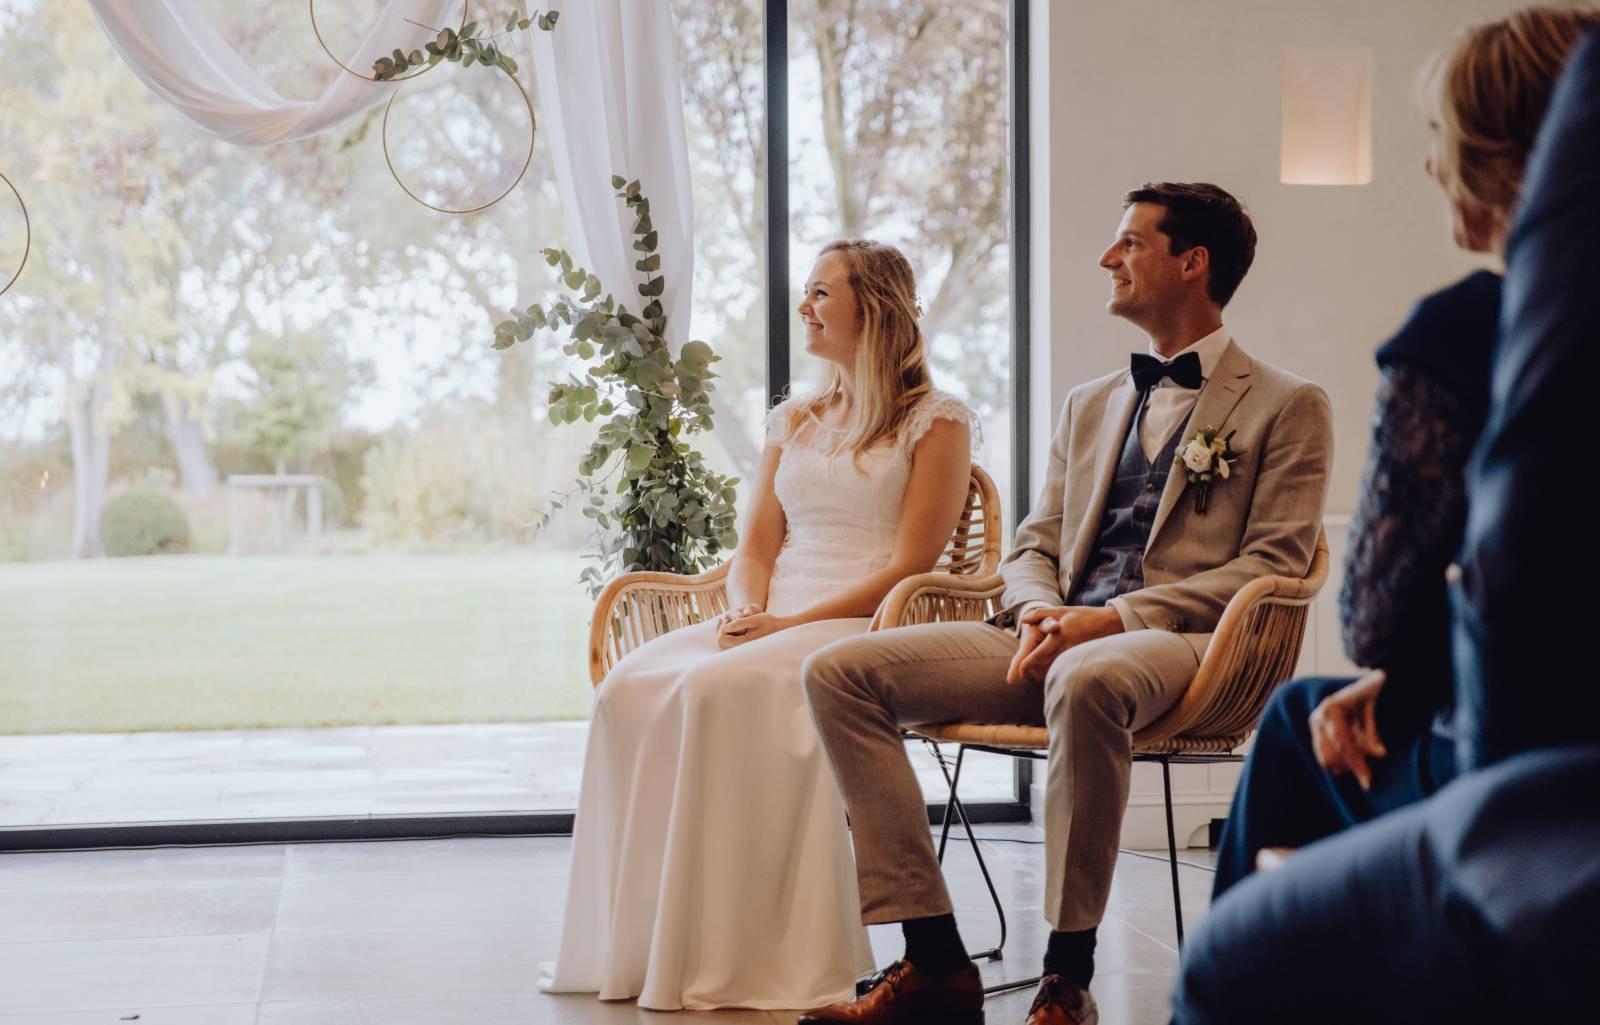 Live 4 Love - Ceremoniespreker - House of Weddings - 21